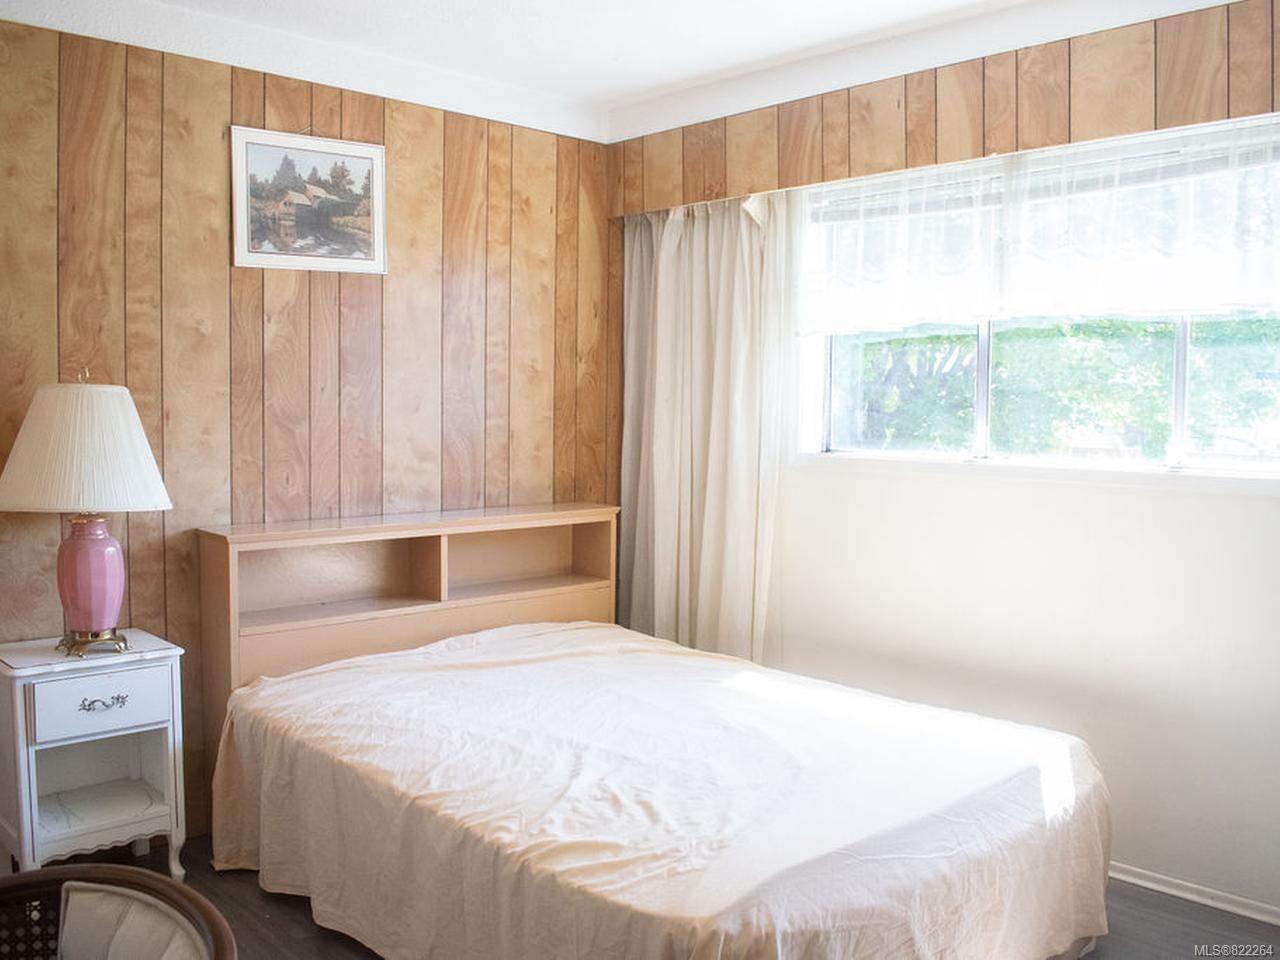 Photo 9: Photos: 4150 Rex Rd in PORT ALBERNI: PA Port Alberni House for sale (Port Alberni)  : MLS®# 822264